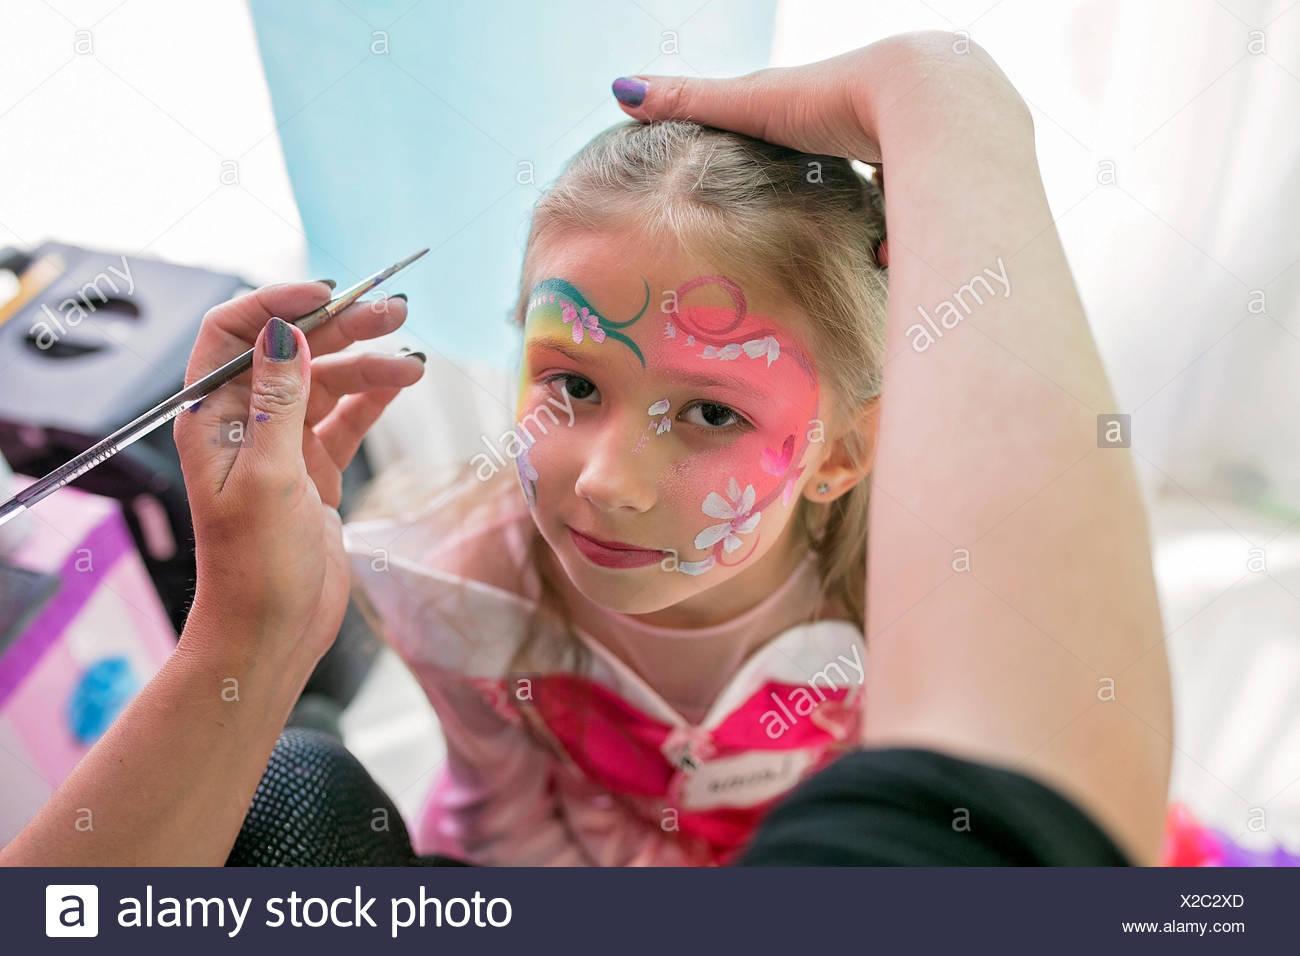 Little girl having her face painted - Stock Image